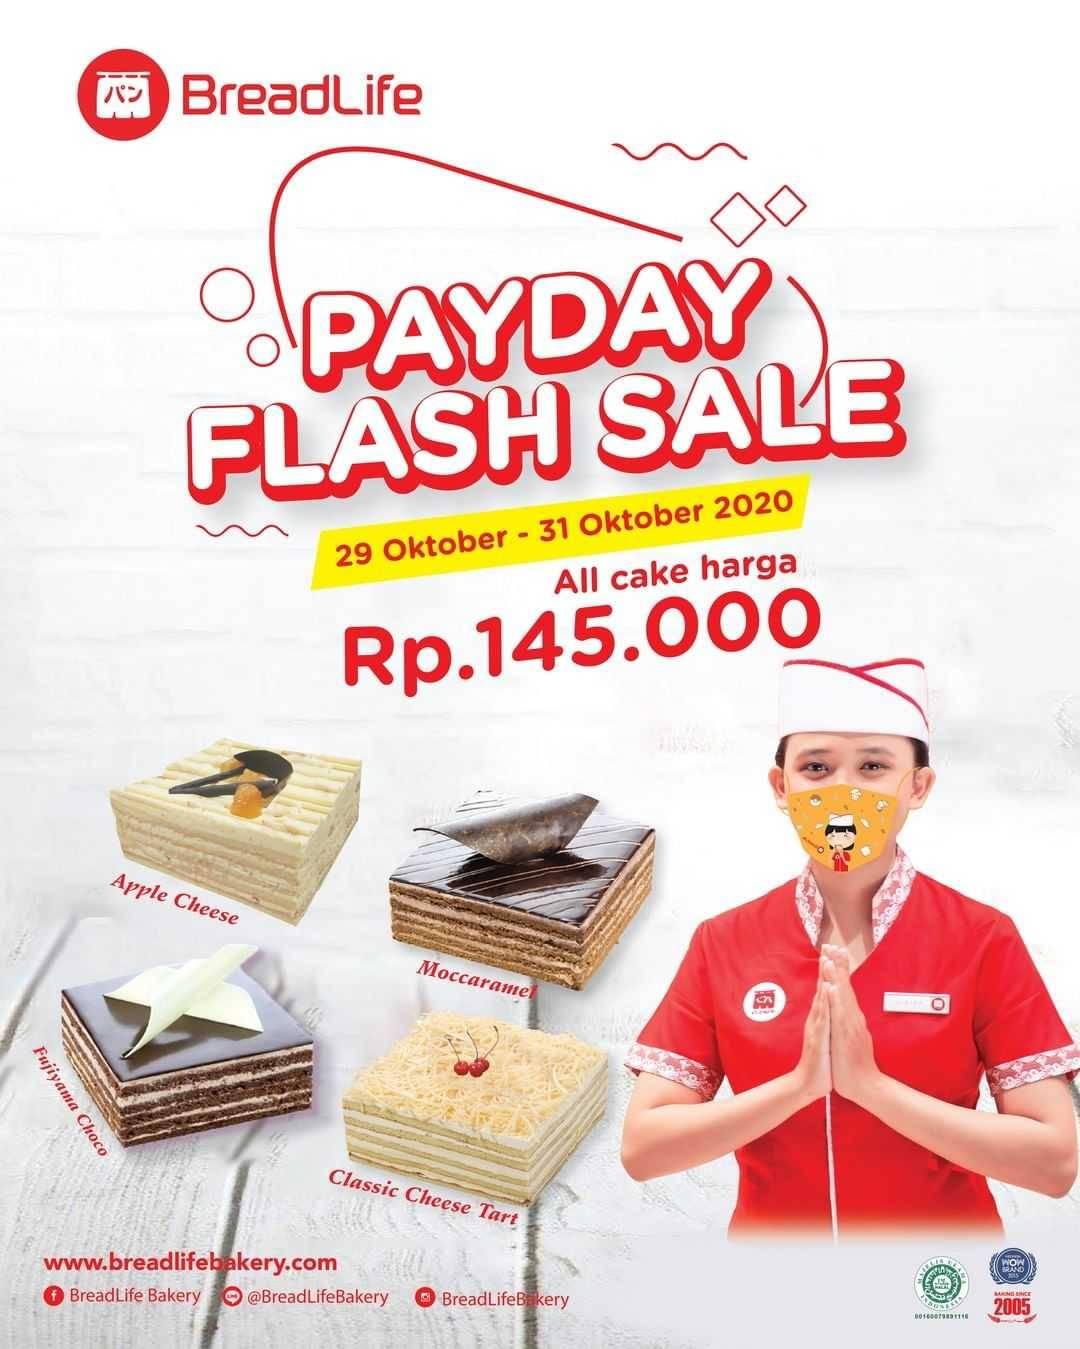 Promo diskon Breadlife Promo Payday Flash Sale All Cake Hanya Rp. 145.000